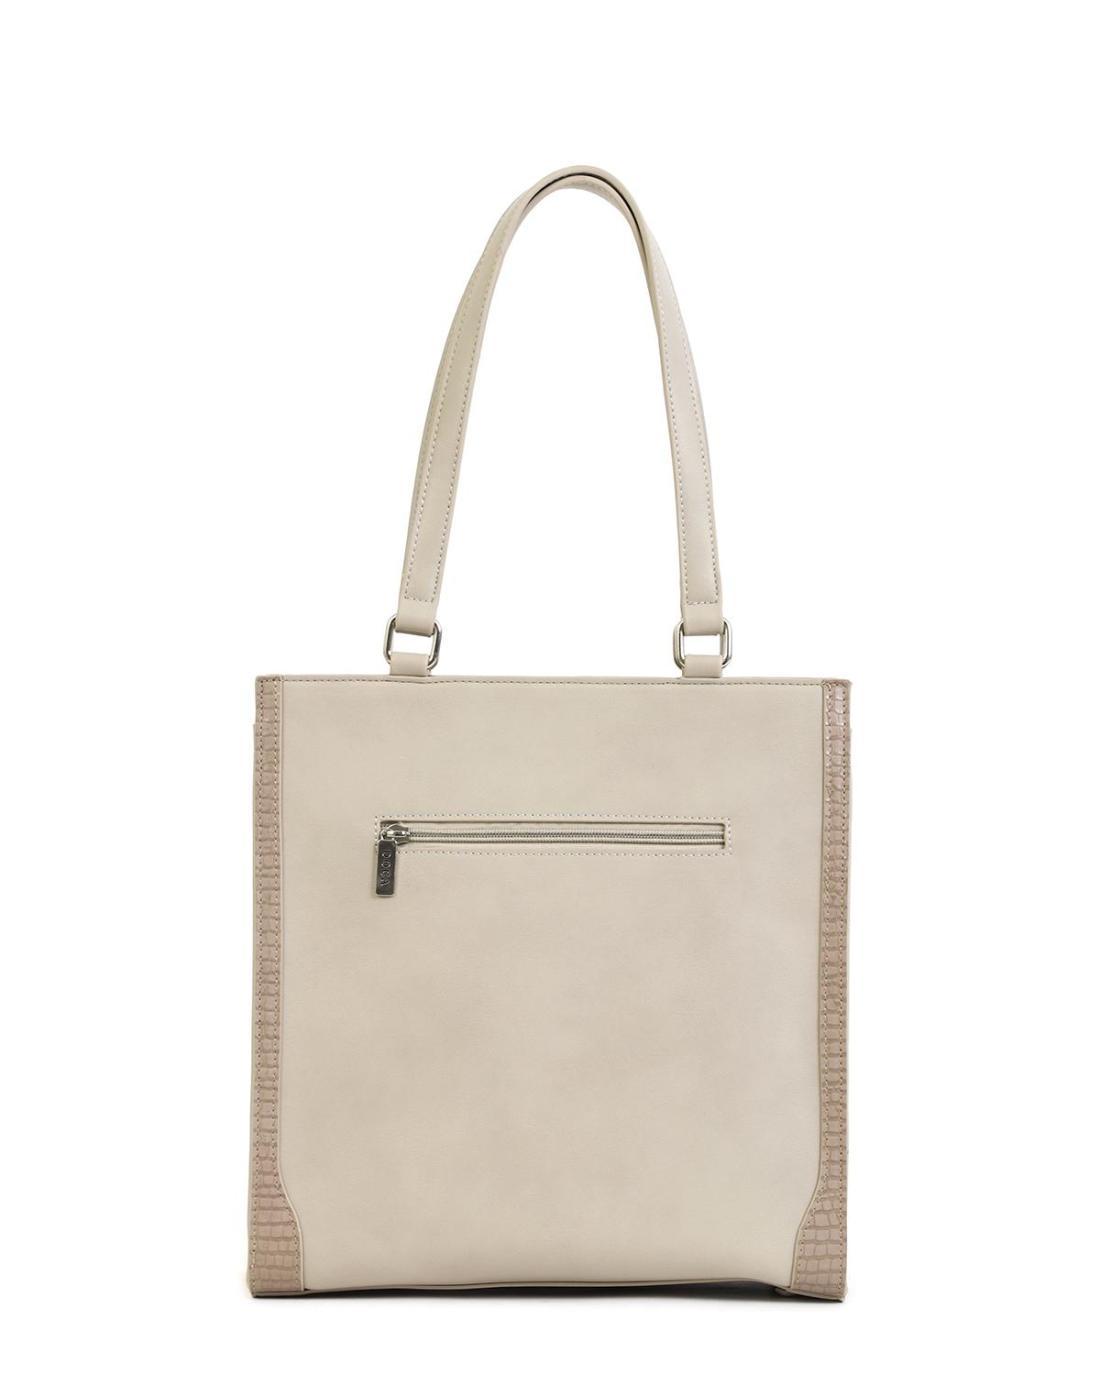 Grau handtasche